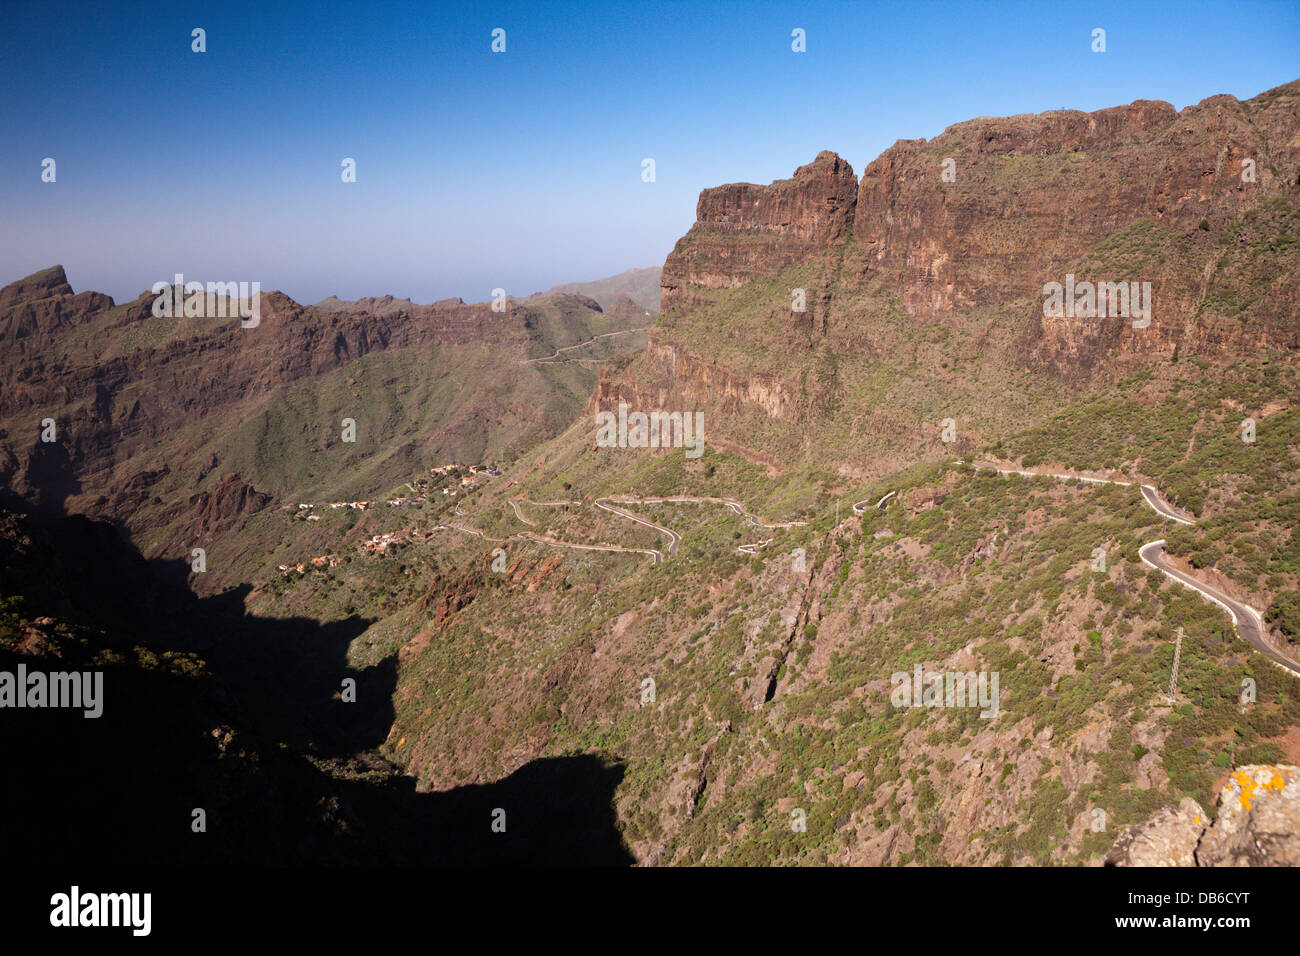 Serpentinen, Masca, Teneriffa, Kanarische Inseln, Spanien Stockbild